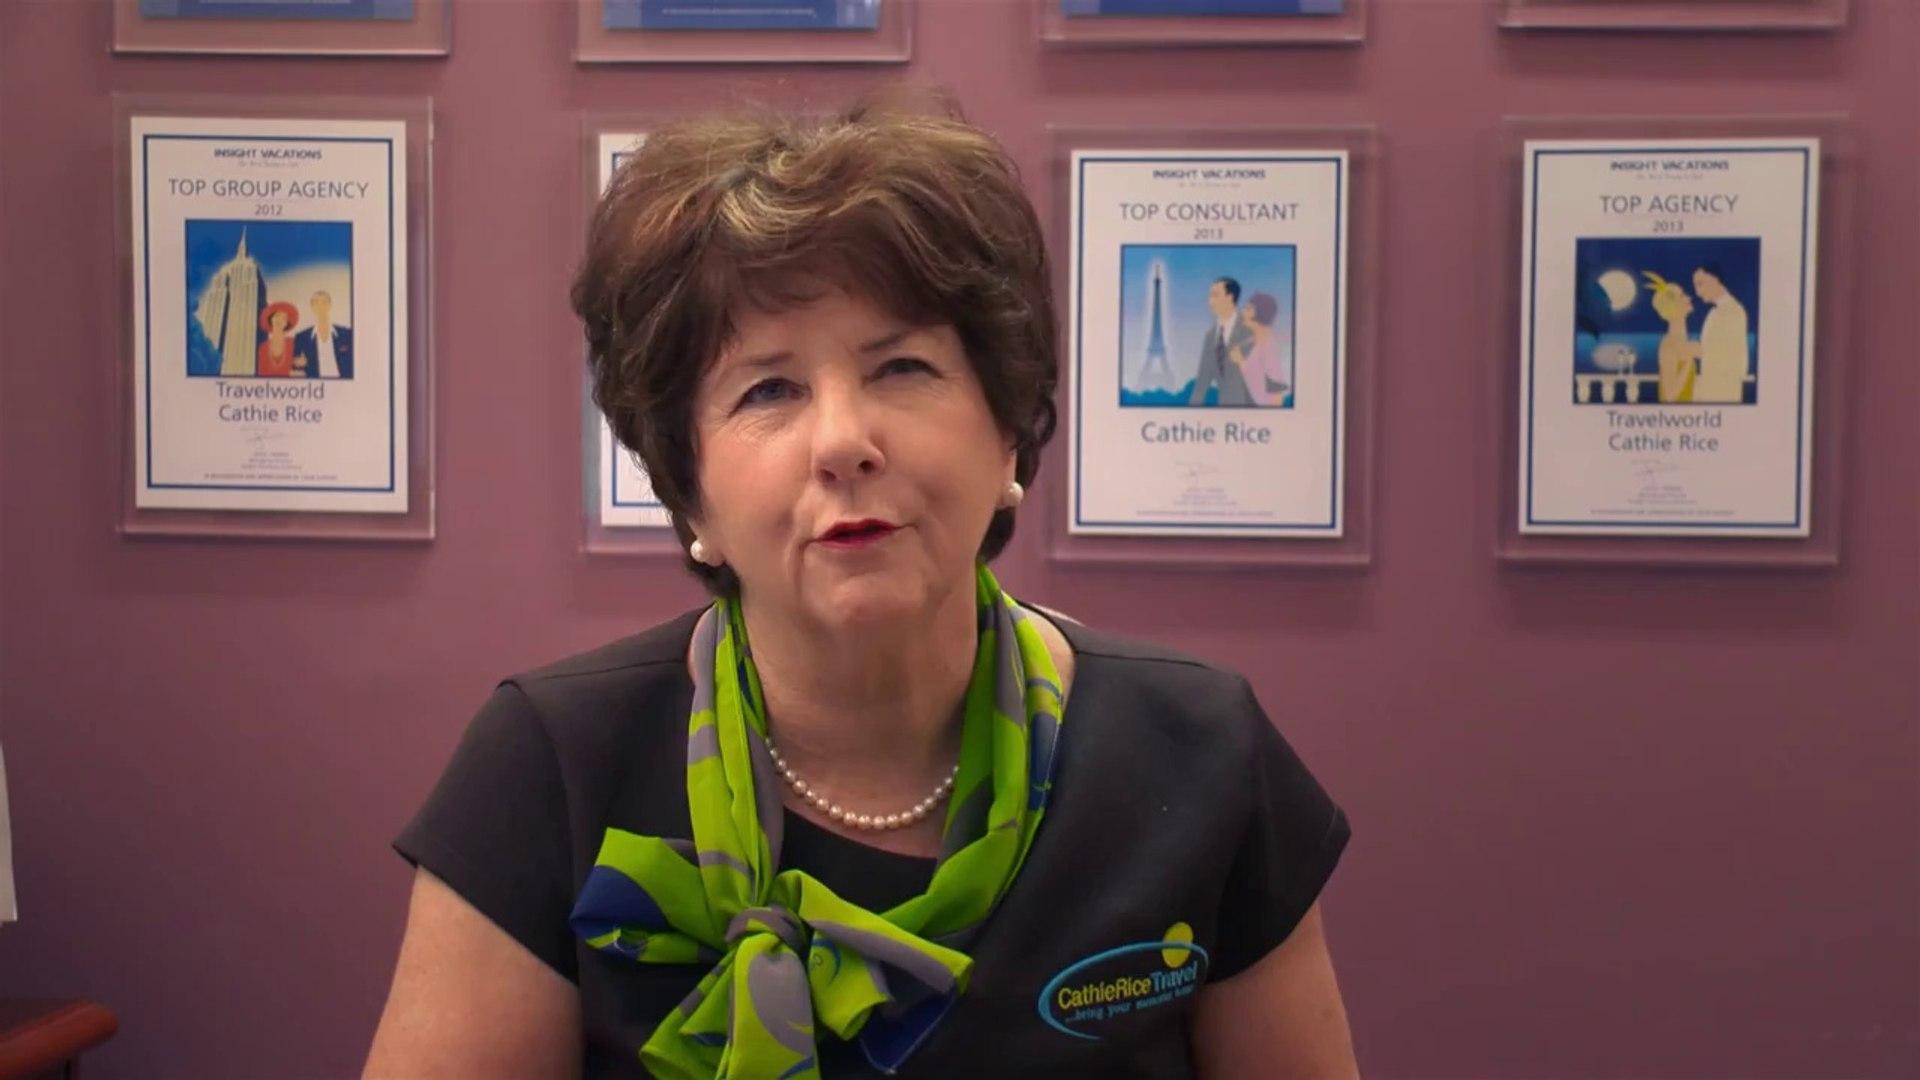 Lomax Media Testimonial - Cathie Rice - Cathie Rice Travel